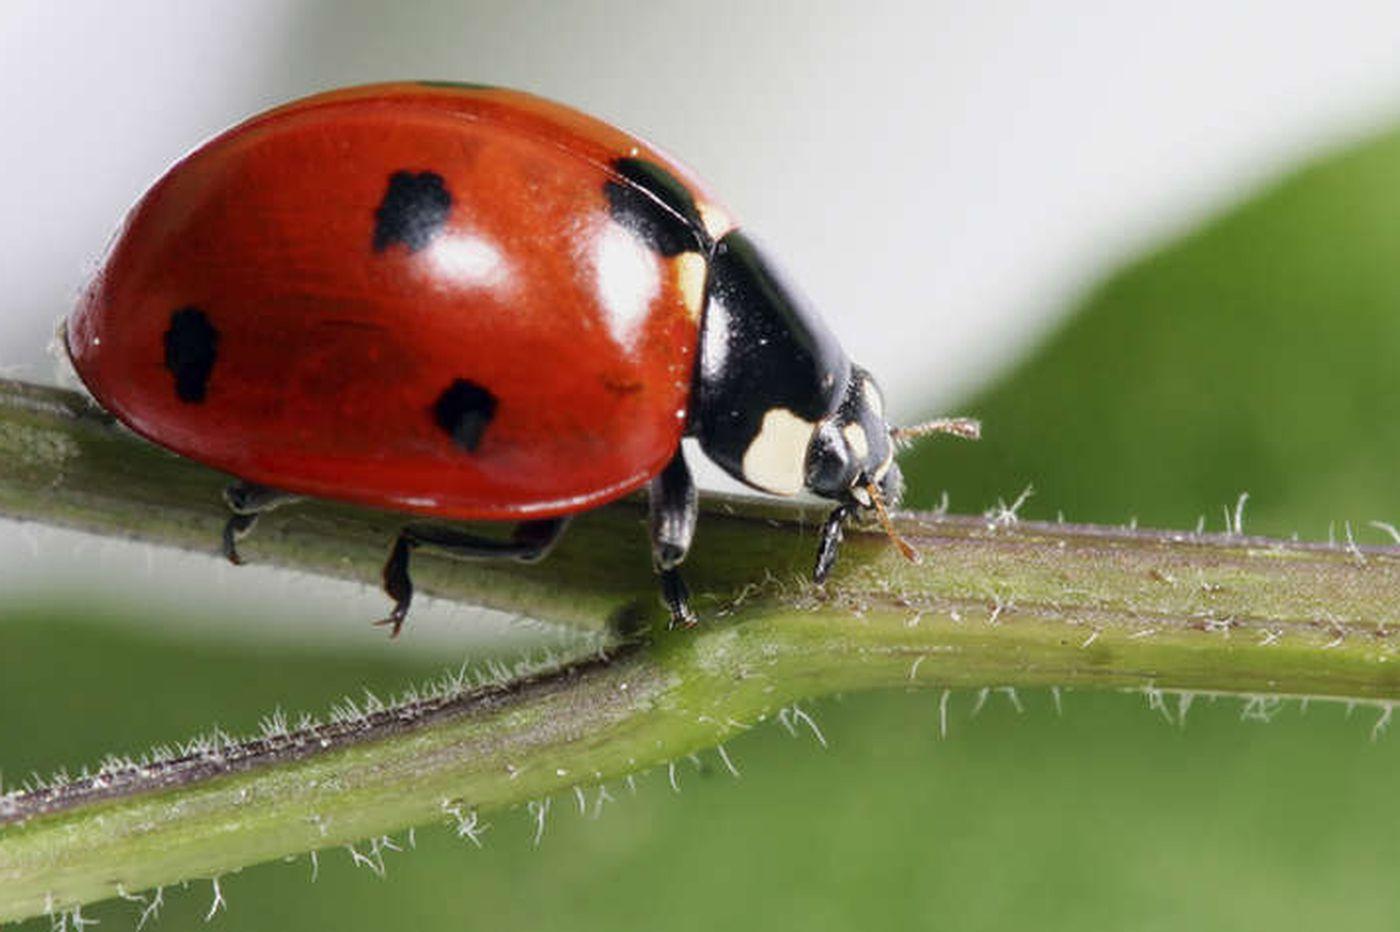 Massive Ladybug Swarm Over California Shows Up On Radar